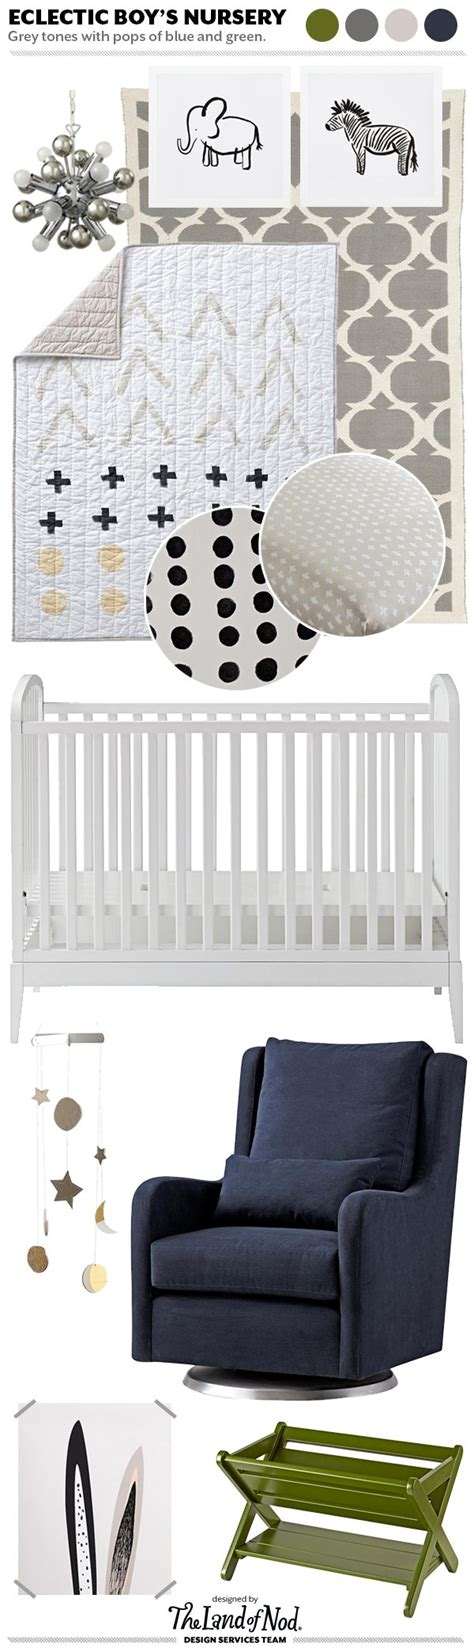 Nod A Way Crib by Design Spotlight Freehand Bedding Two Ways Honest To Nod